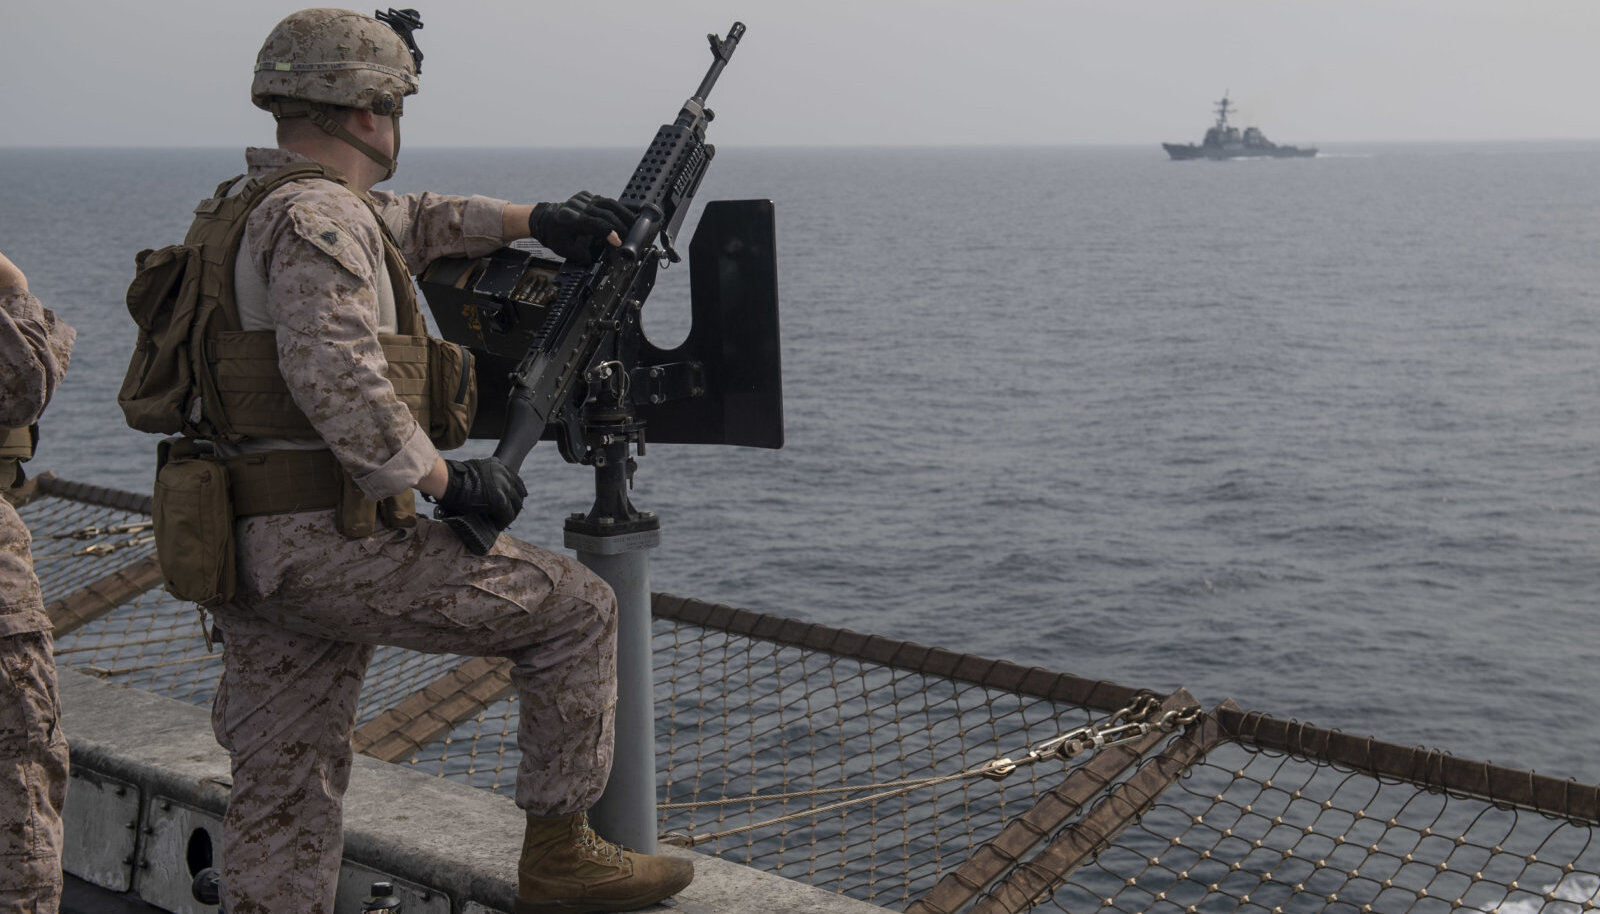 Illustratiivne pilt USA merevägede sõdurist (foto: ZUMAPRESS.com / Scanpix)